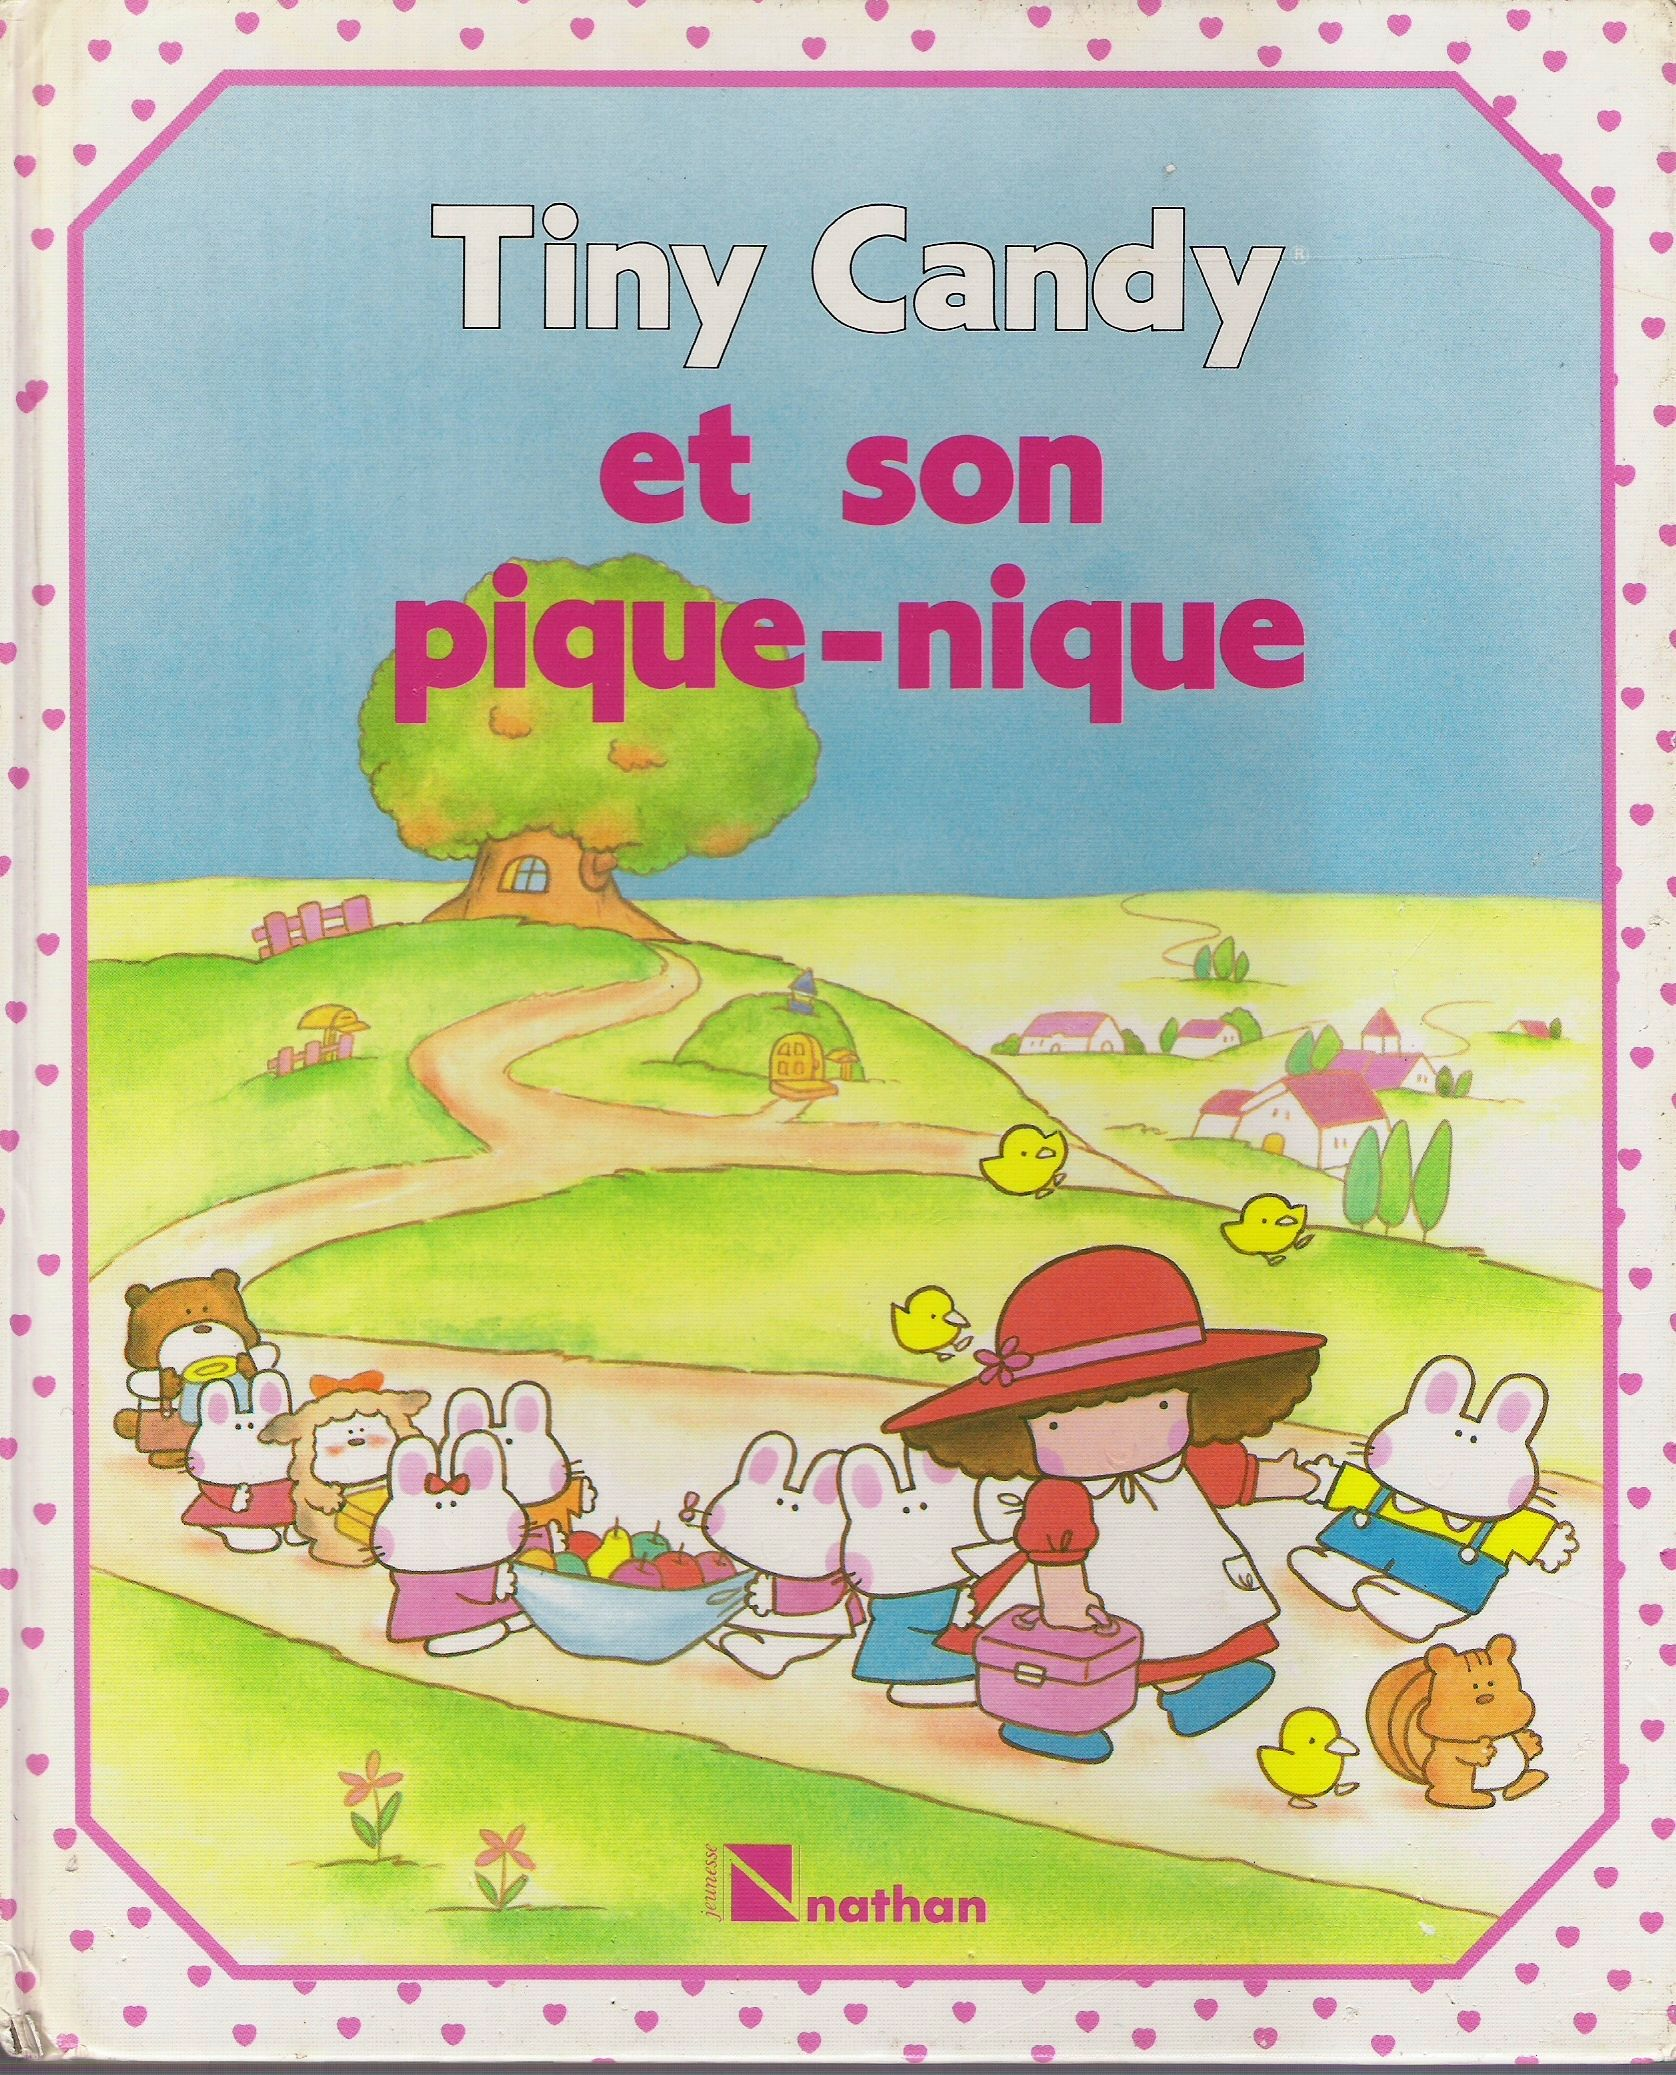 Tiny Candy et son pique-nique